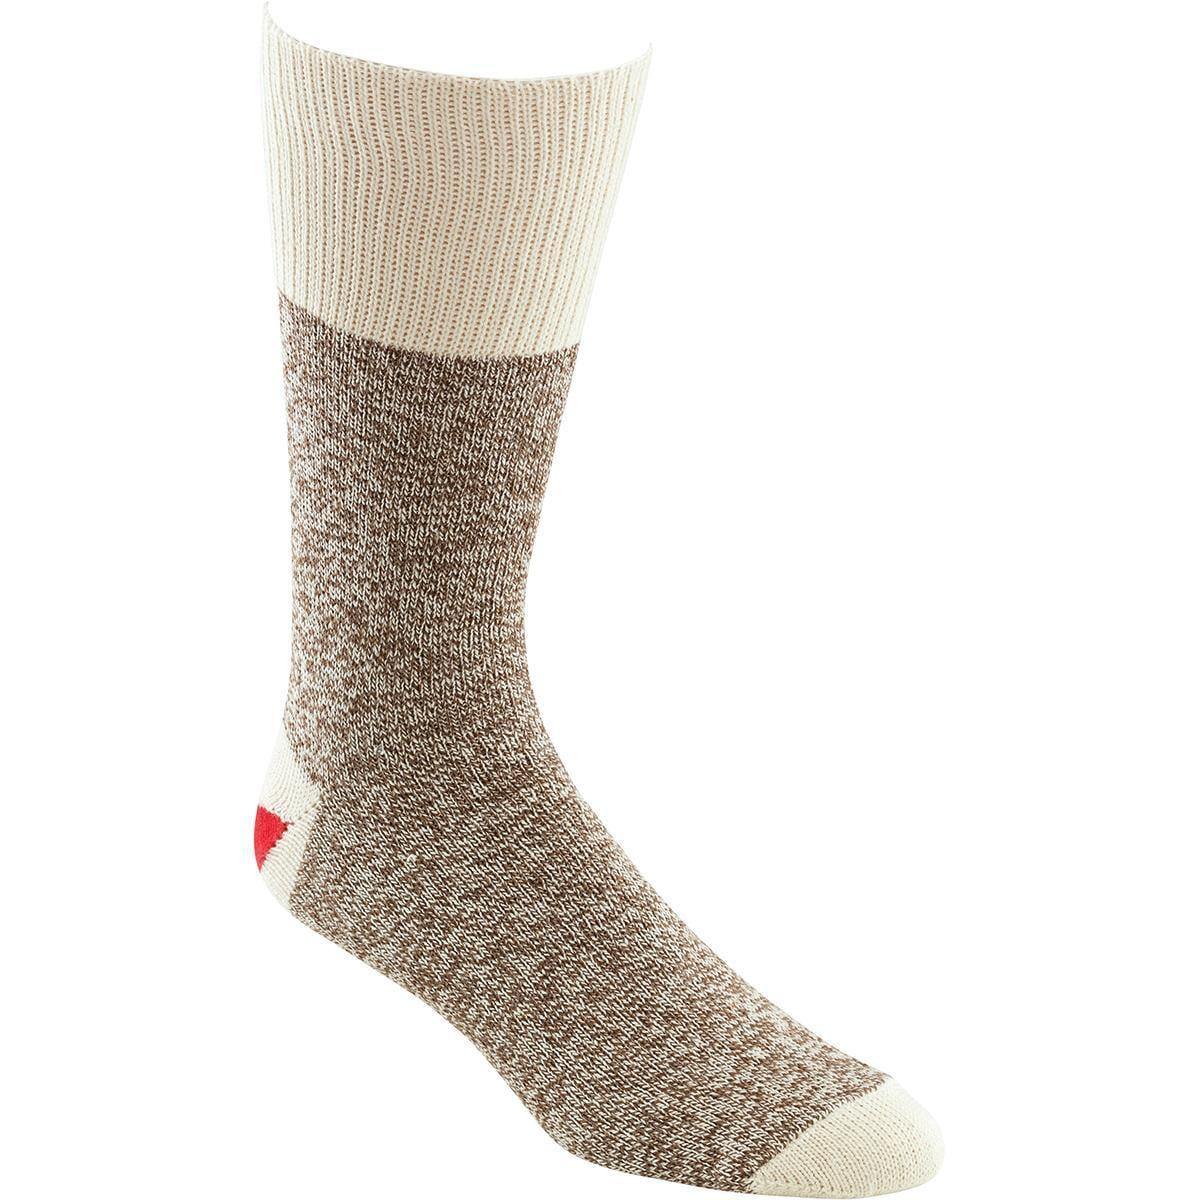 Fox River Red Heel Monkey Socks 2 Pairs - Size 8-9 Brown ...